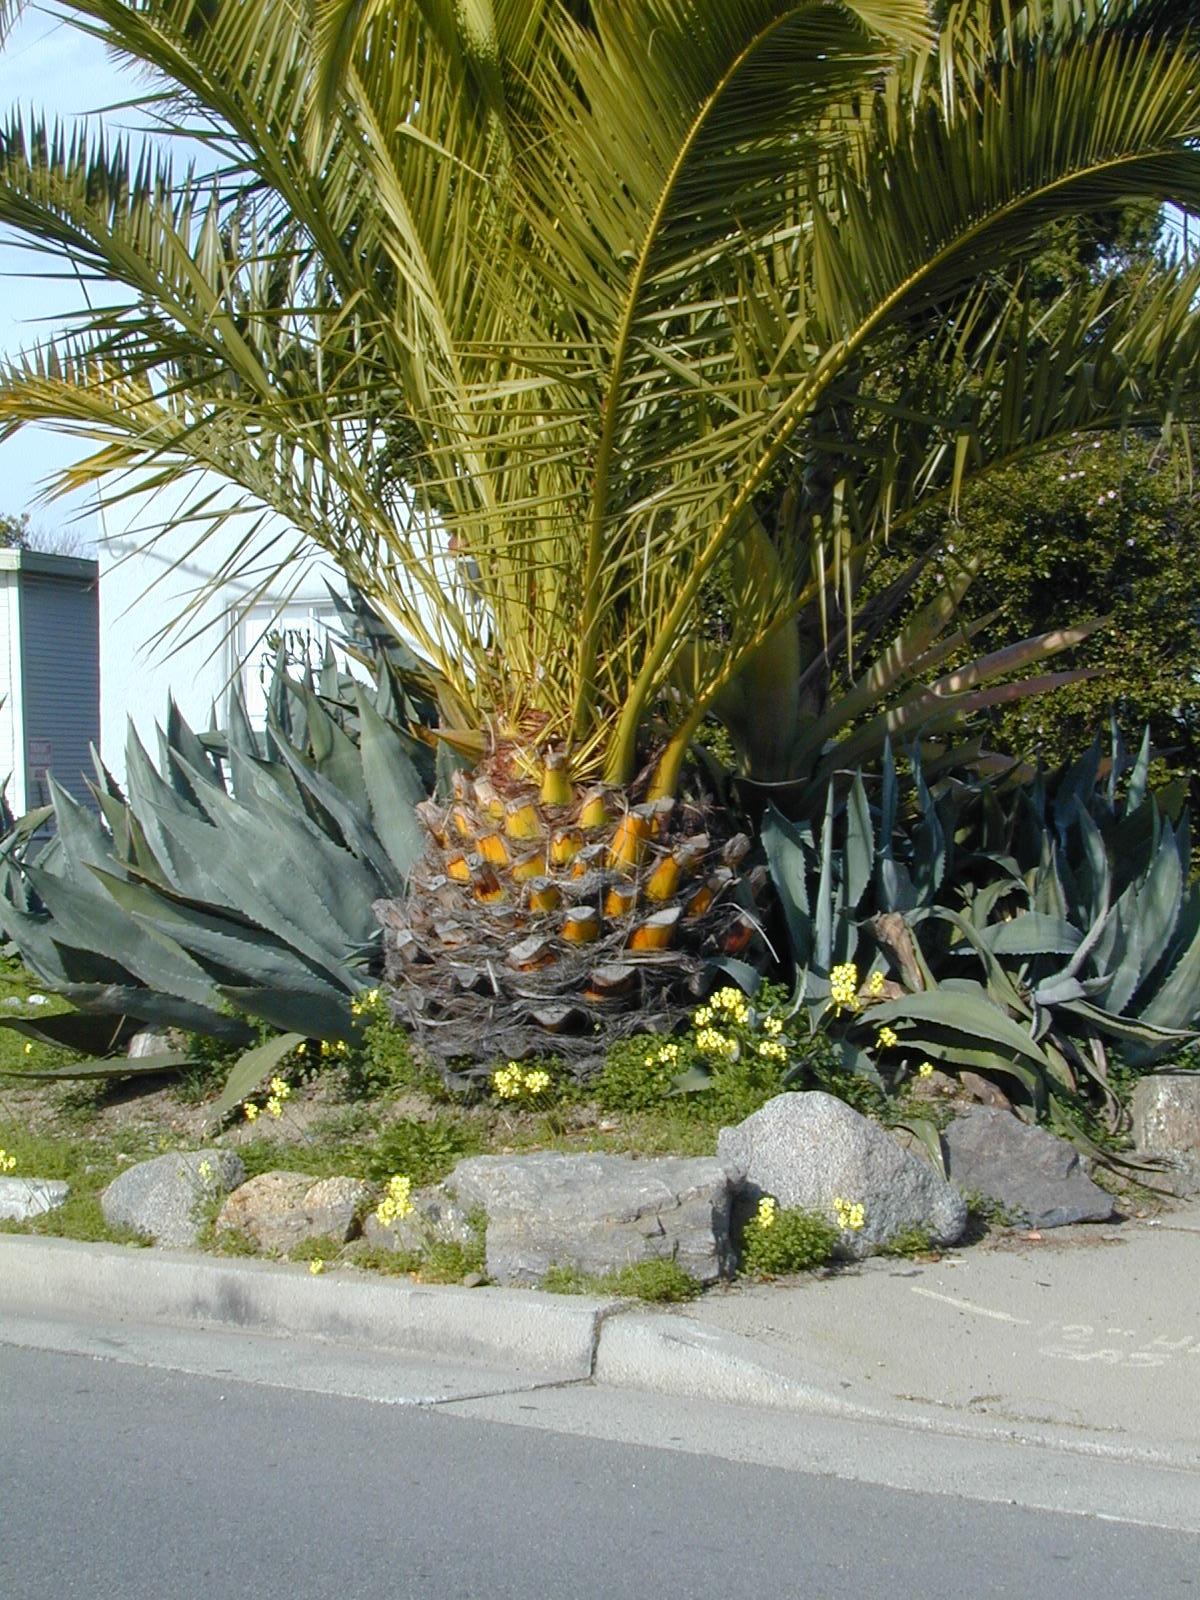 trees of santa cruz county phoenix canariensis canary island palm. Black Bedroom Furniture Sets. Home Design Ideas